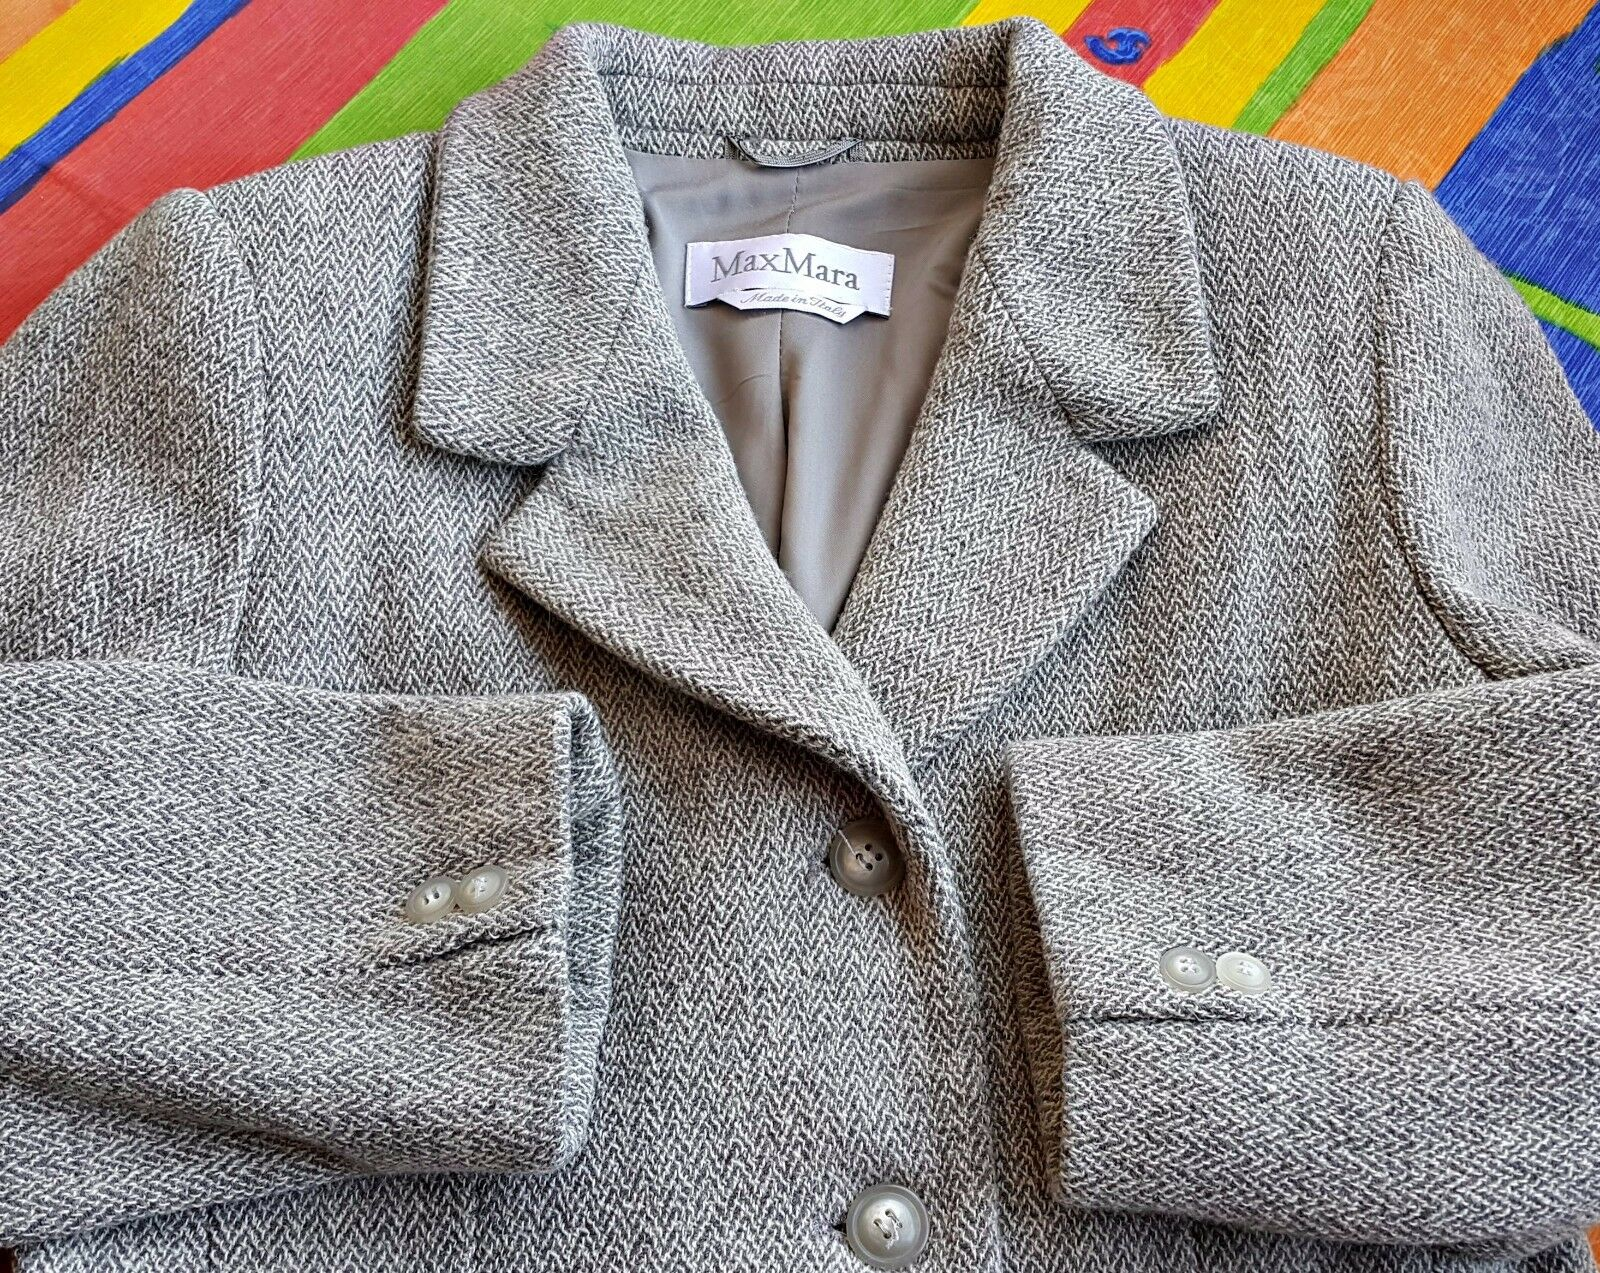 -vintage -vintage -vintage Max Mara Herringbone mezcla de lana gris Para Mujer jacket-Talla  us12 eu42 d33056